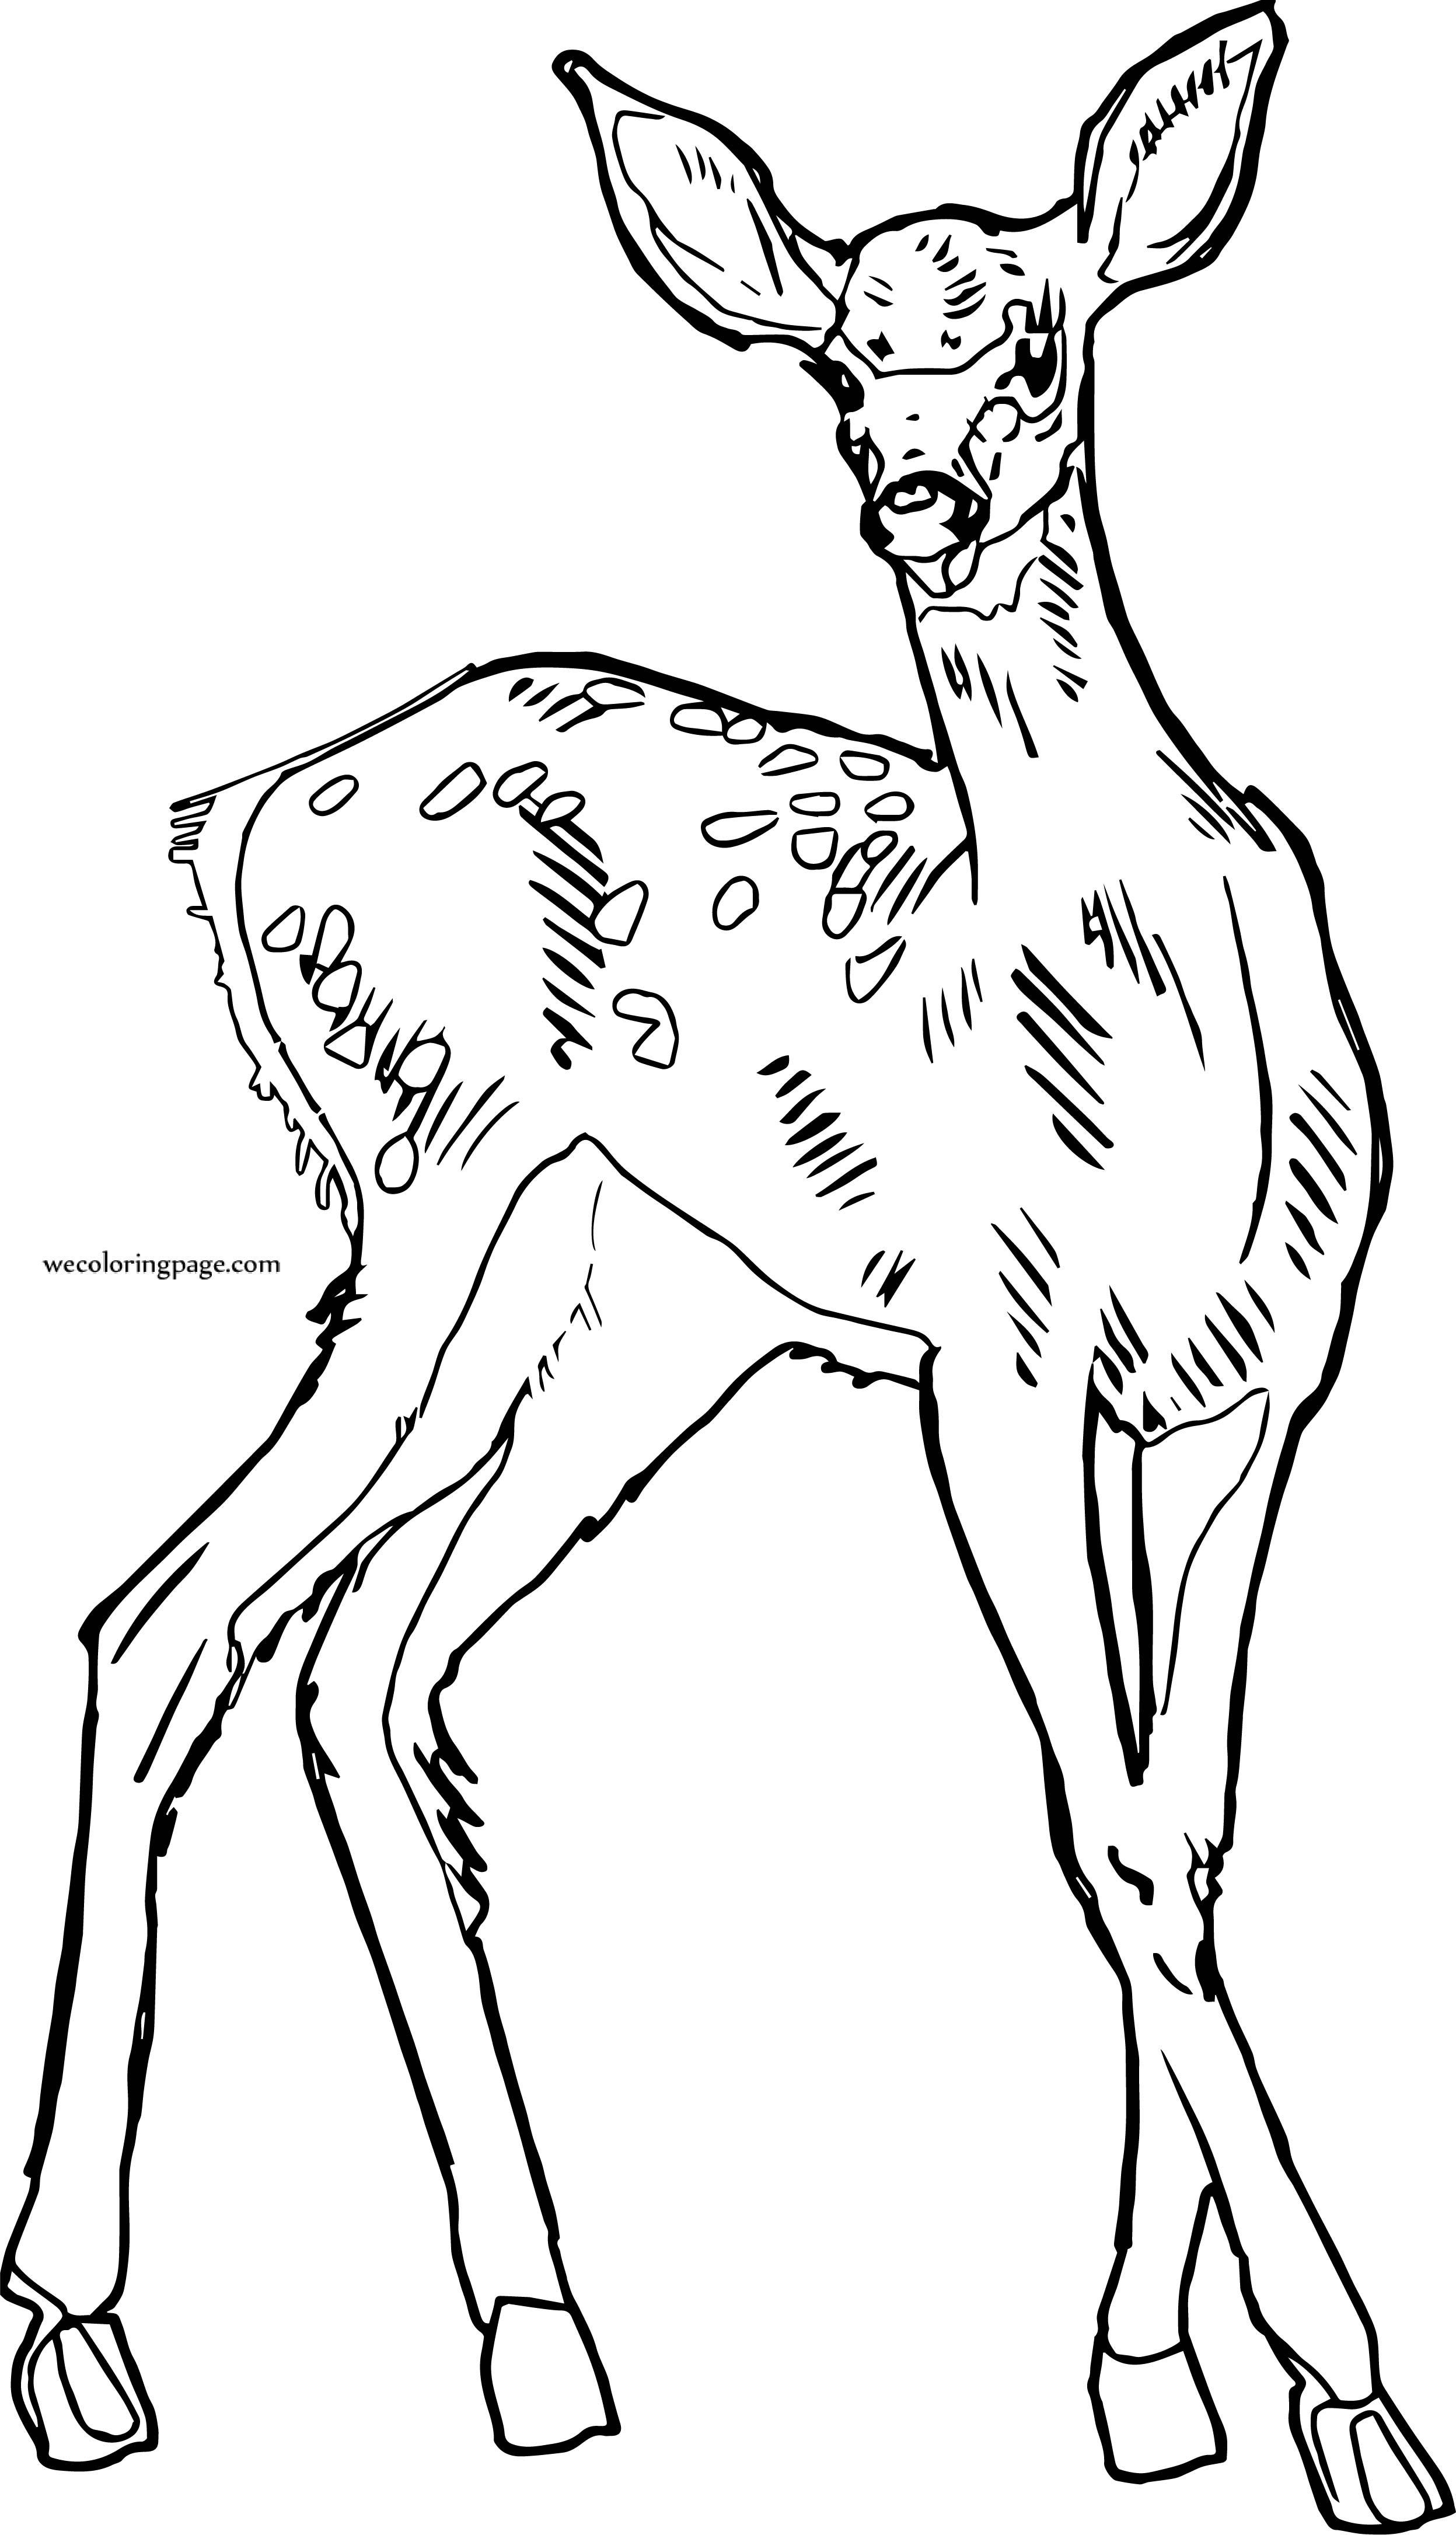 Girl Deer Free Image Coloring Page